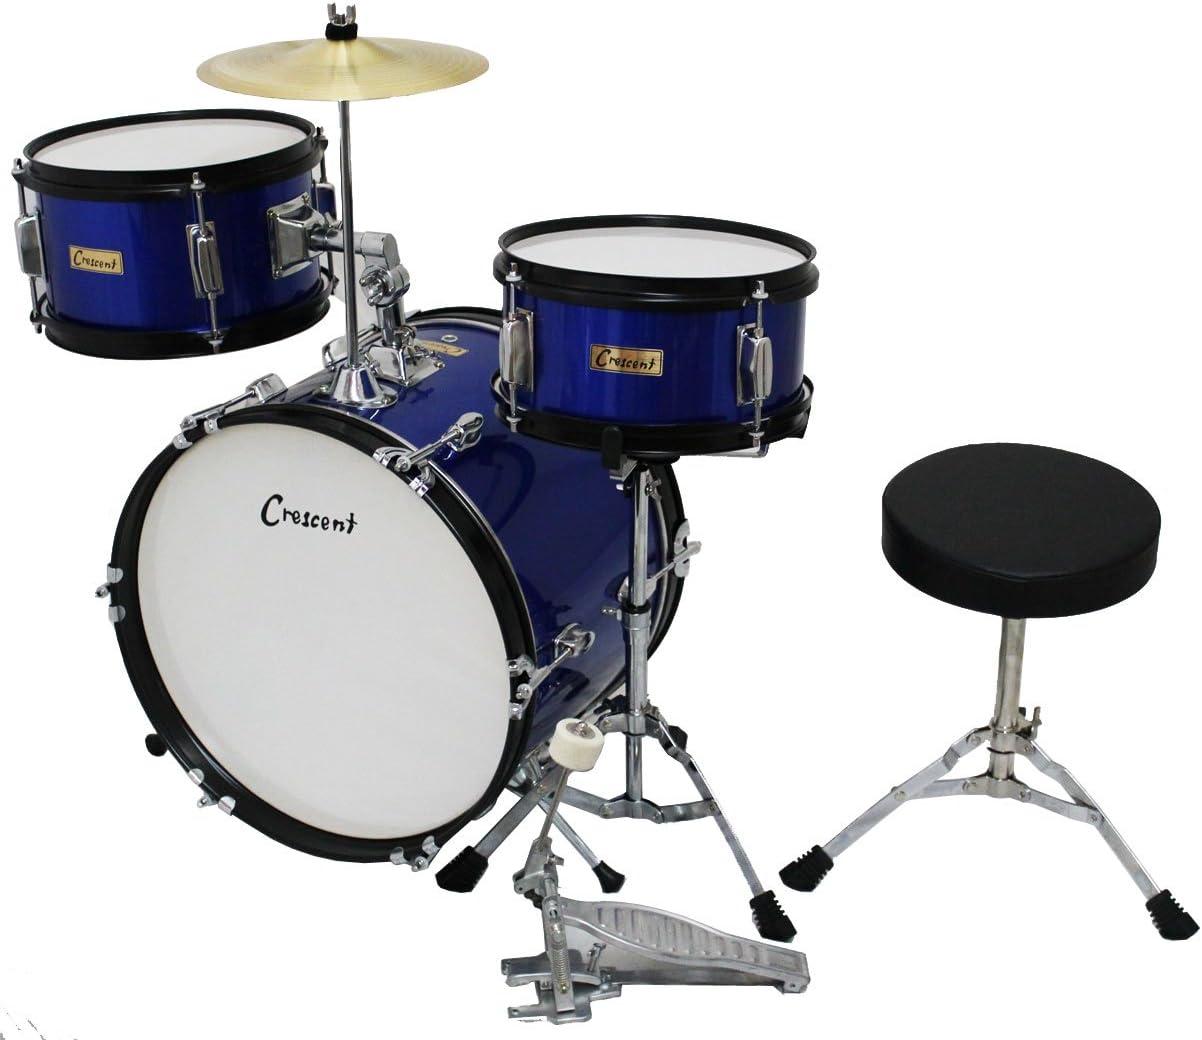 Crescent Blue Metallic 16 いよいよ人気ブランド Inch Beginner 期間限定の激安セール Drum Junior Bas with Set